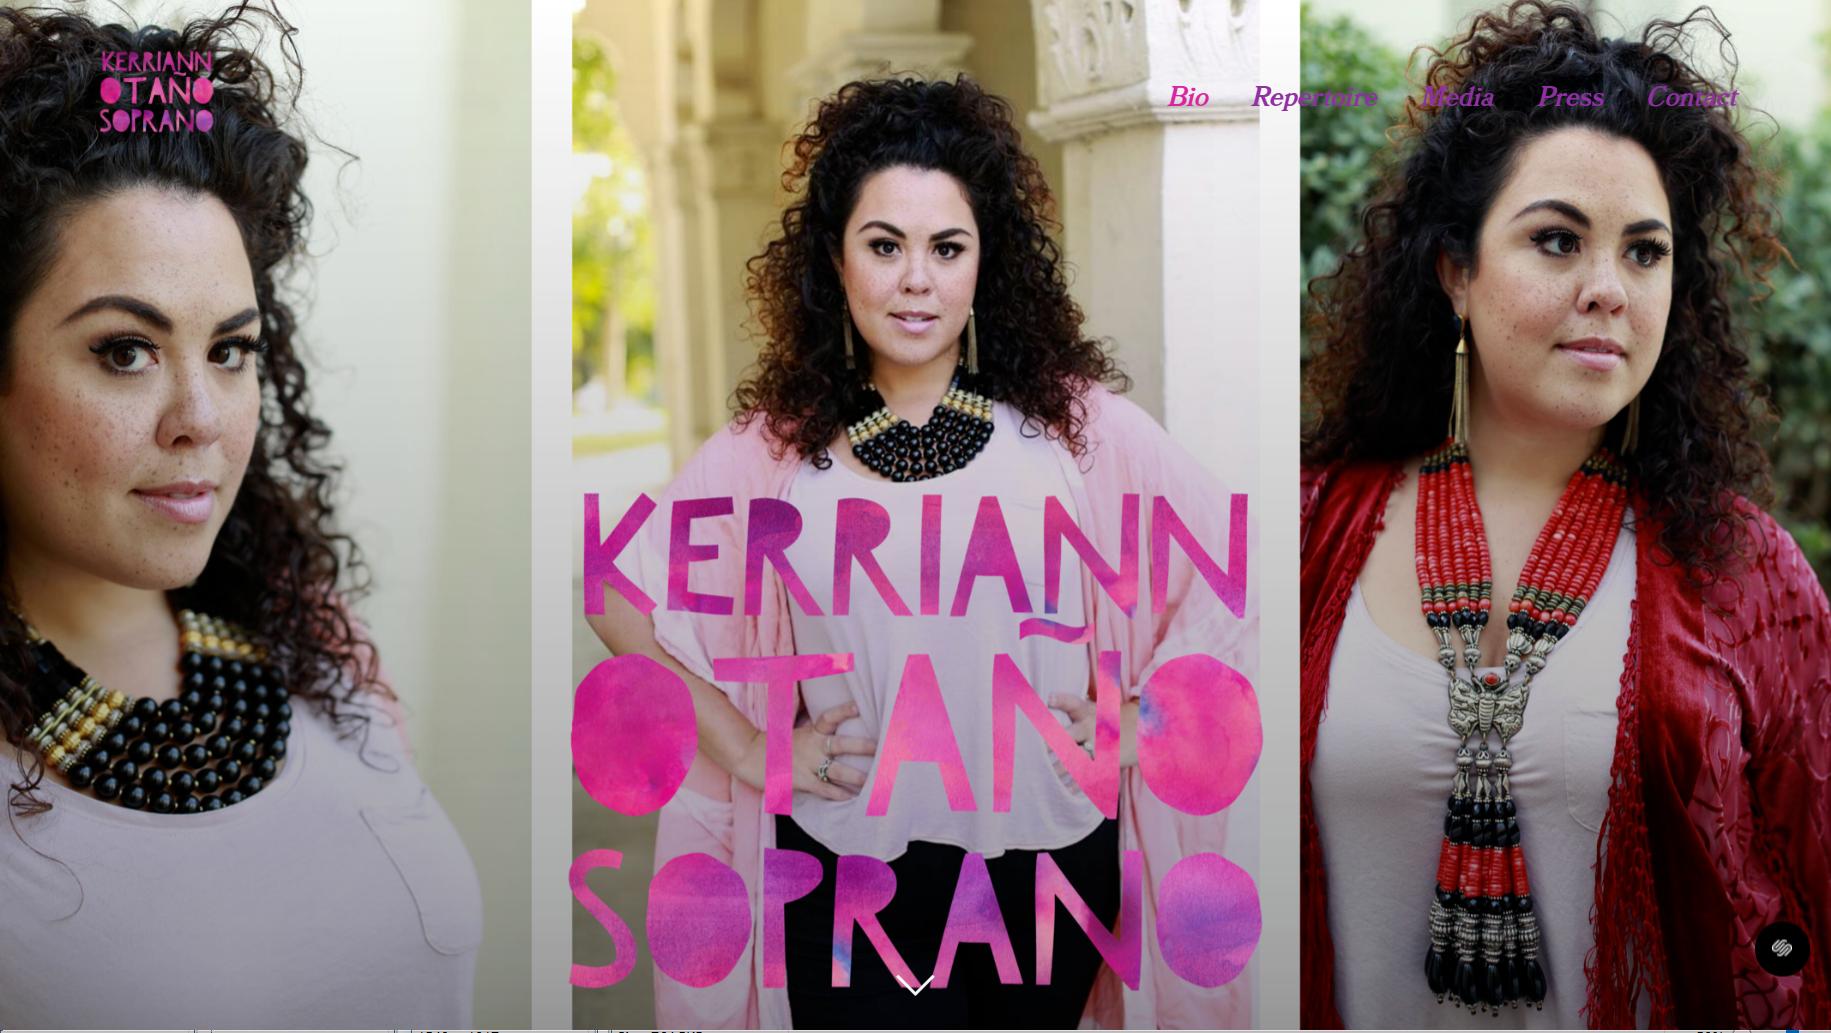 Kerriann Otano, soprano